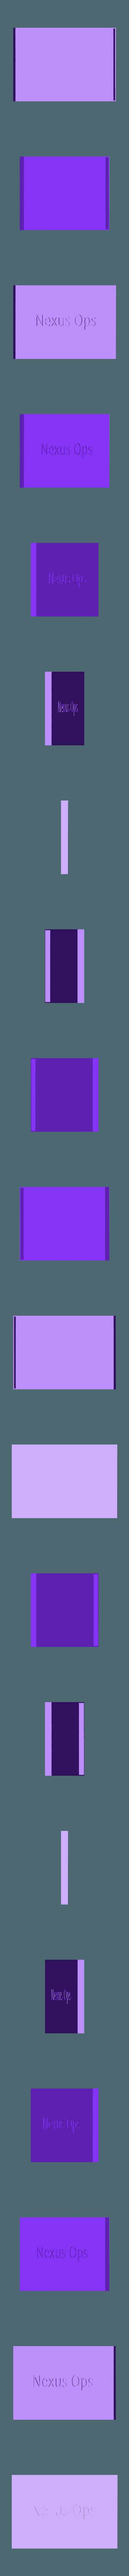 Nexus_Ops_-_Utility_Lid.stl Download free STL file Nexus Ops Insert Cases • 3D printing object, Hardcore3D